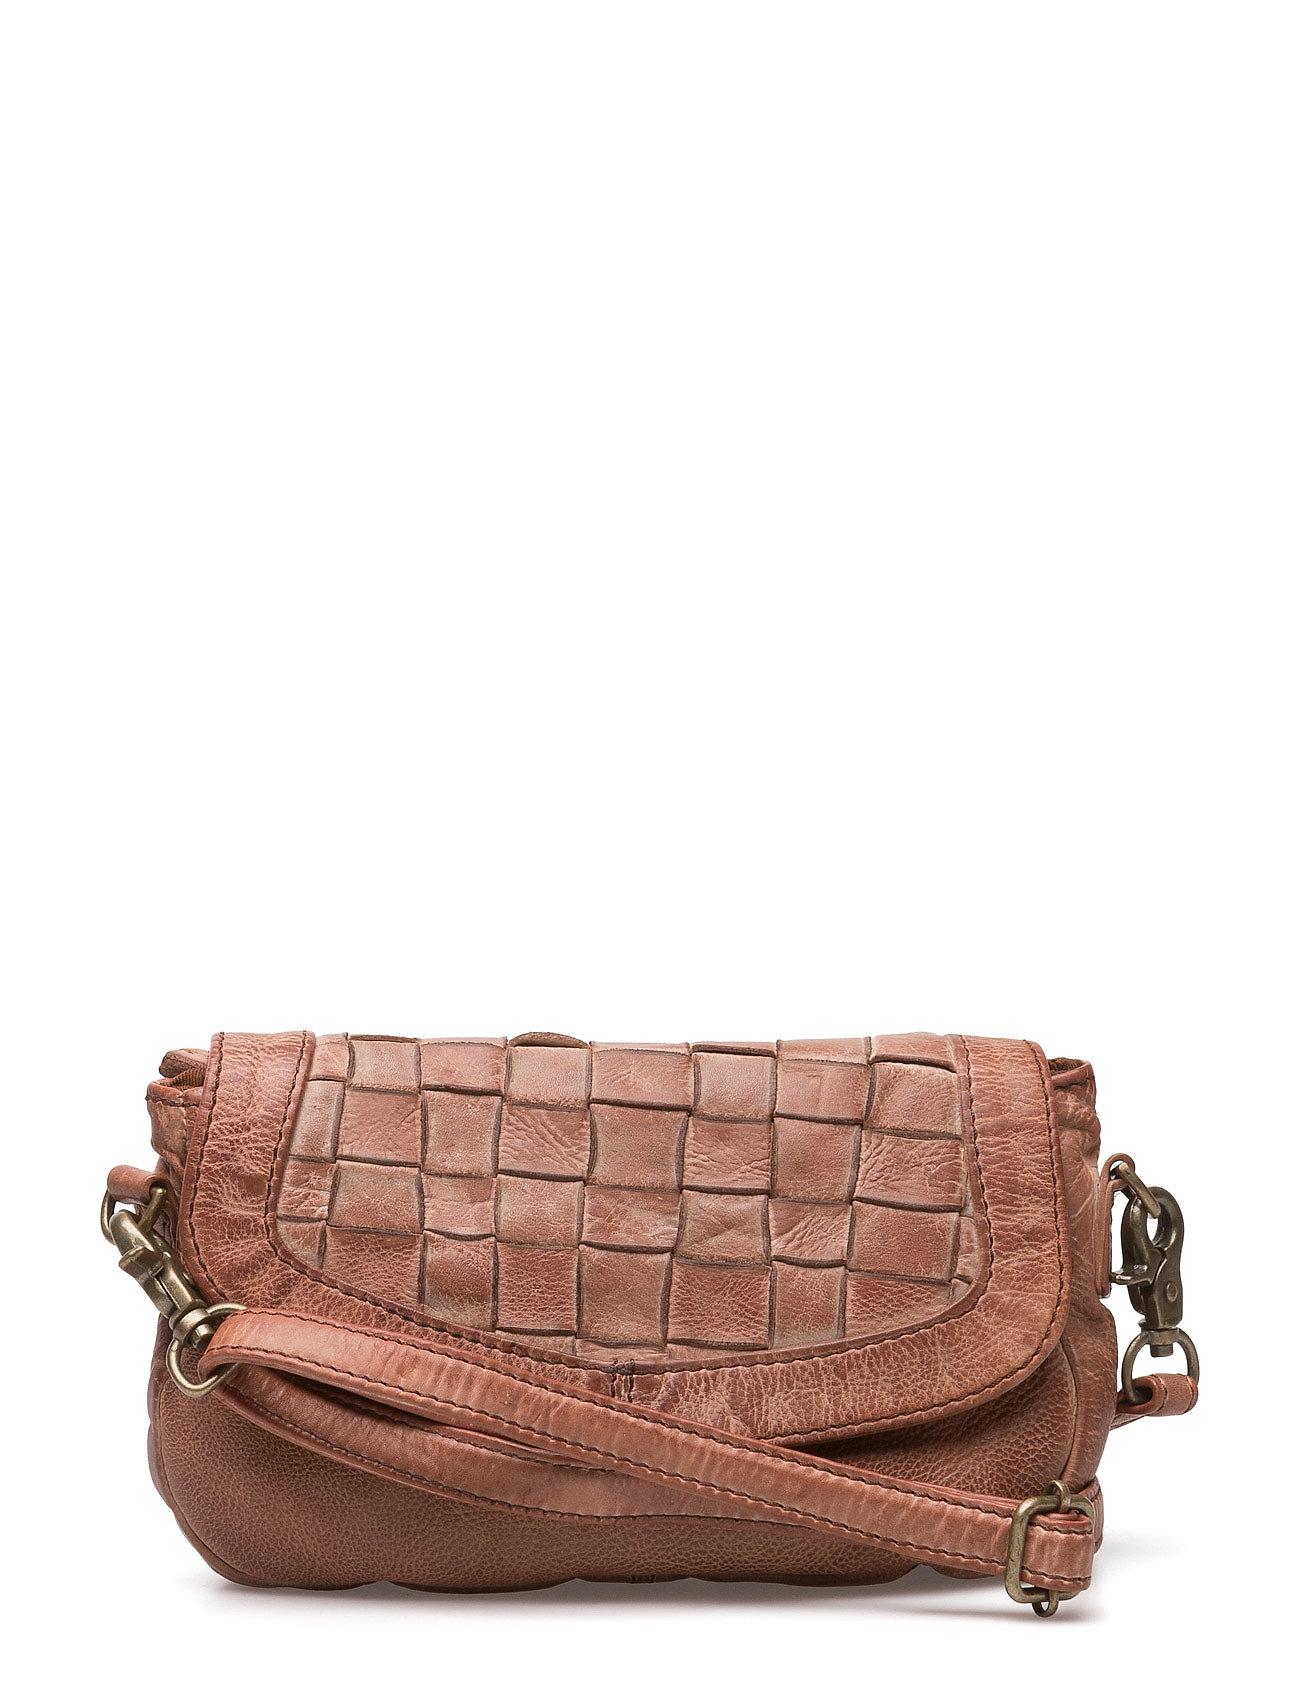 Small Bag / Clutch DEPECHE Små tasker til Damer i cognac